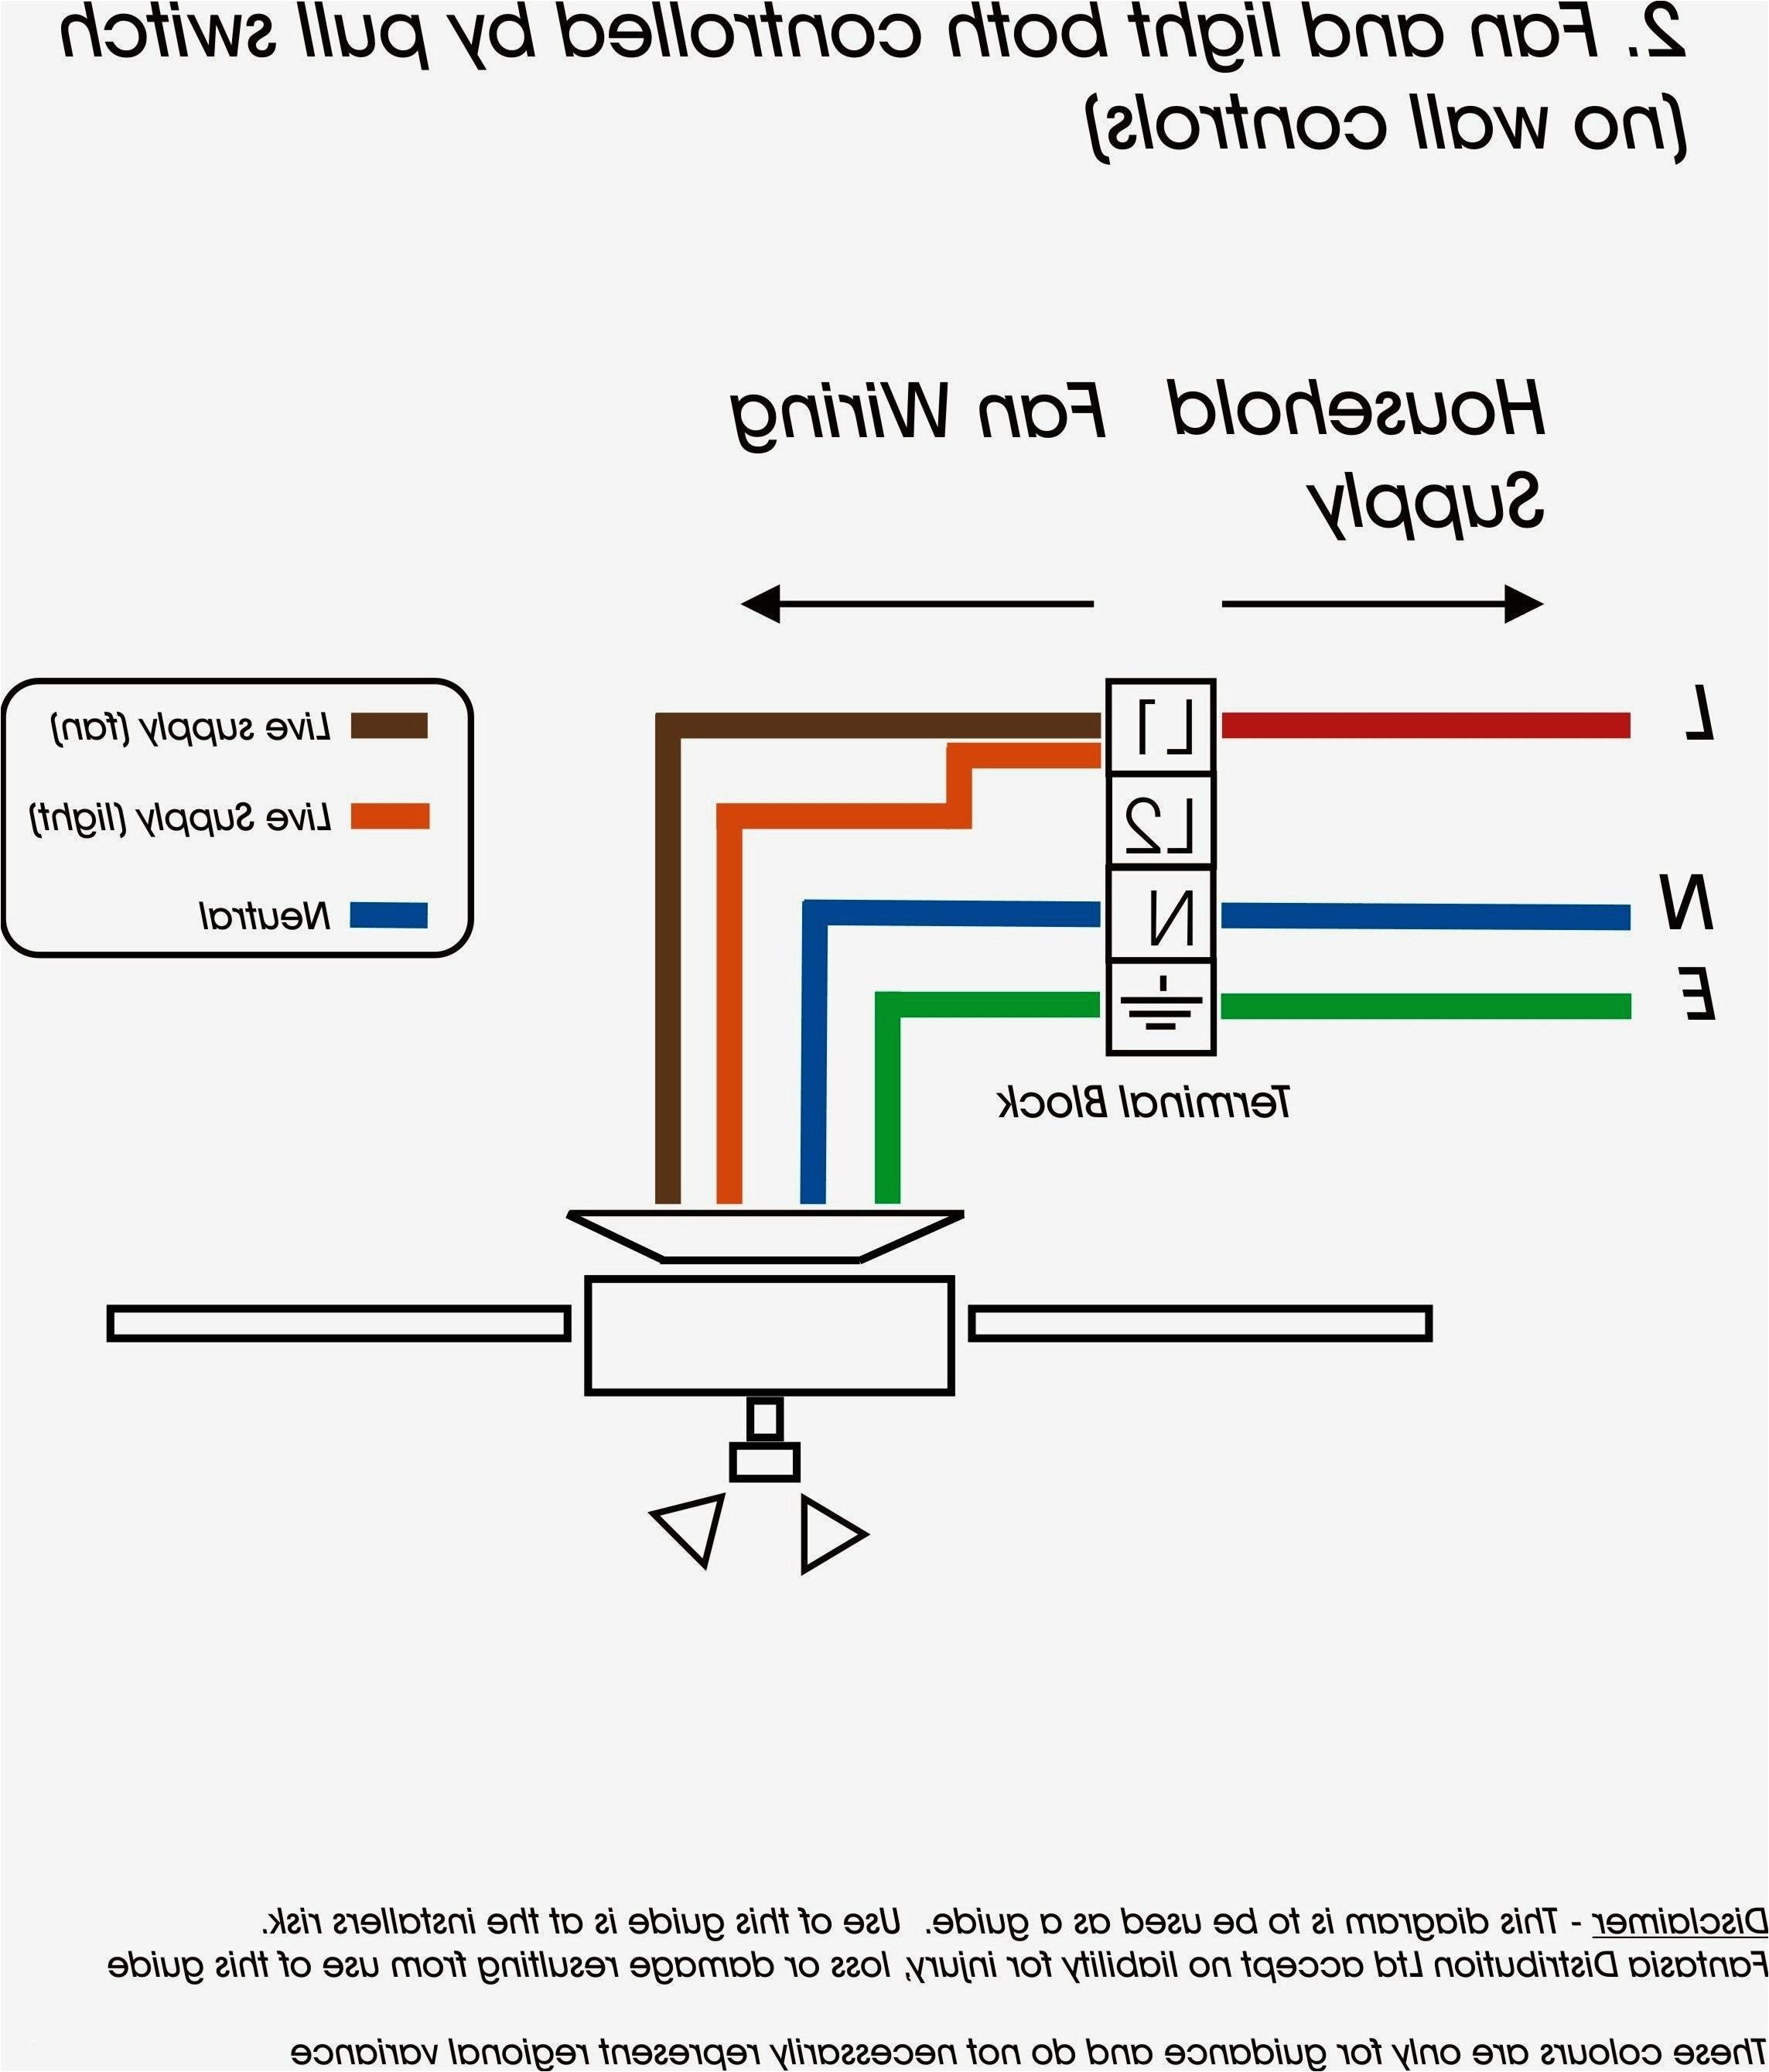 3 wire diagram wiring diagram 480v 3 phase wiring diagram for light wiring diagram center480v 3